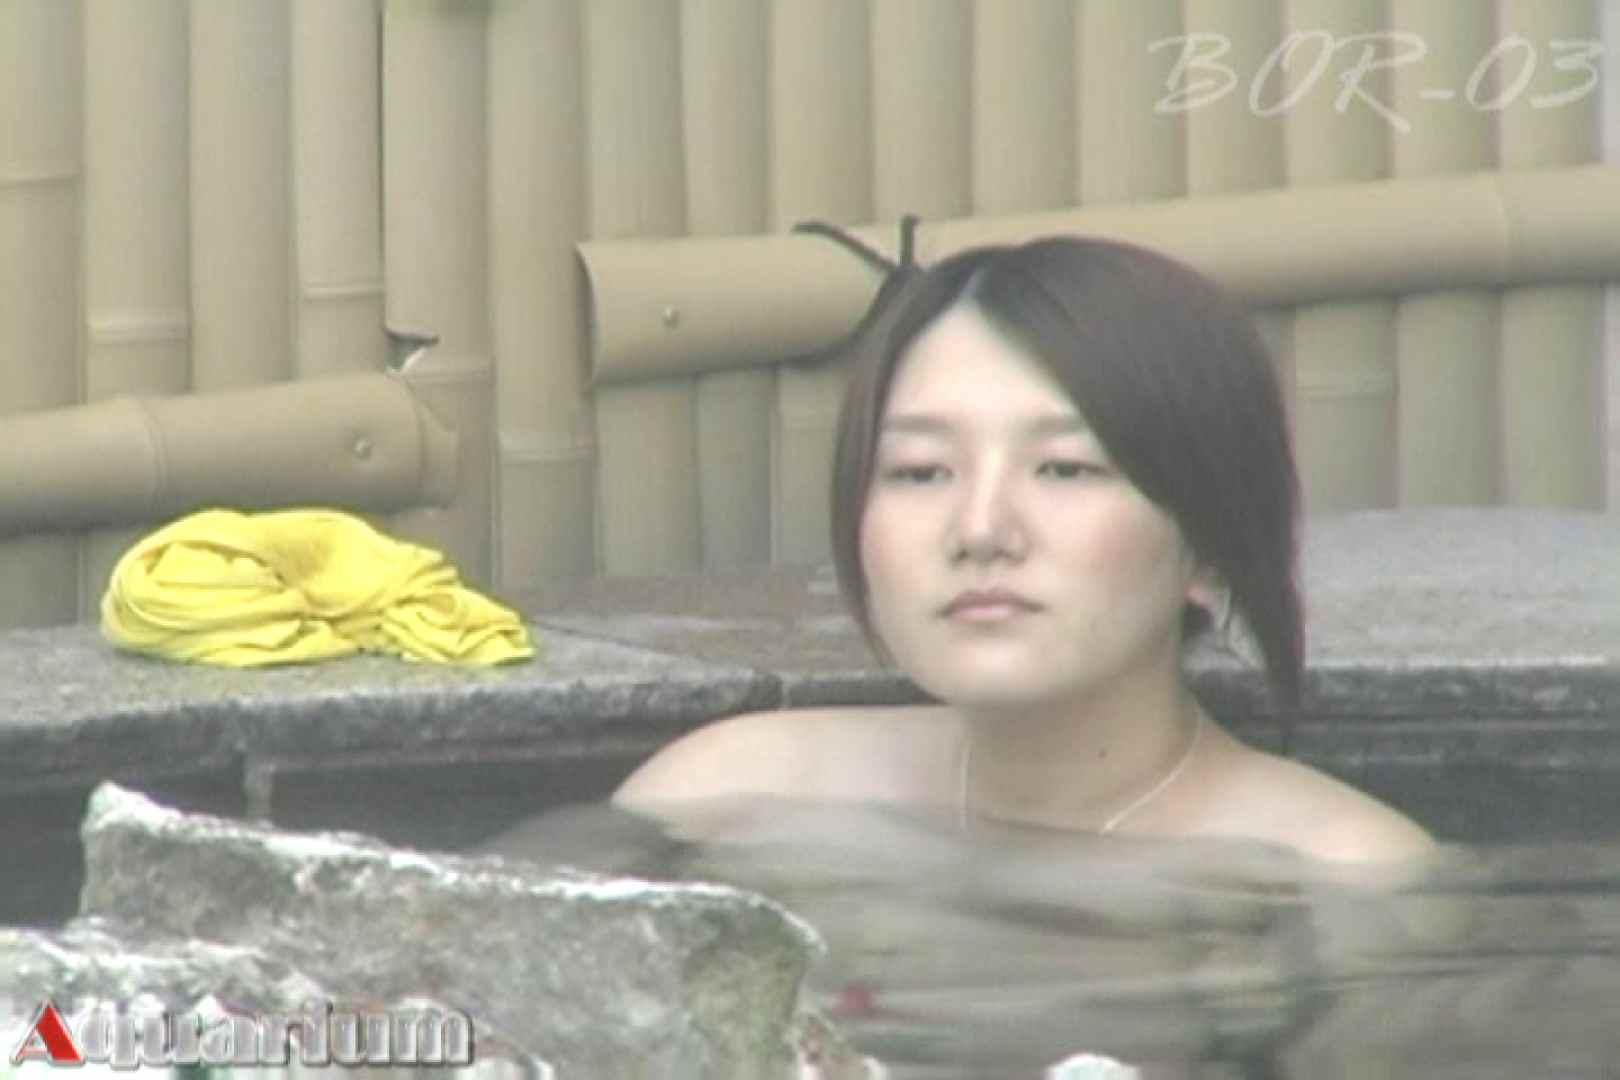 Aquaな露天風呂Vol.487 OLのエロ生活   露天風呂  95連発 49